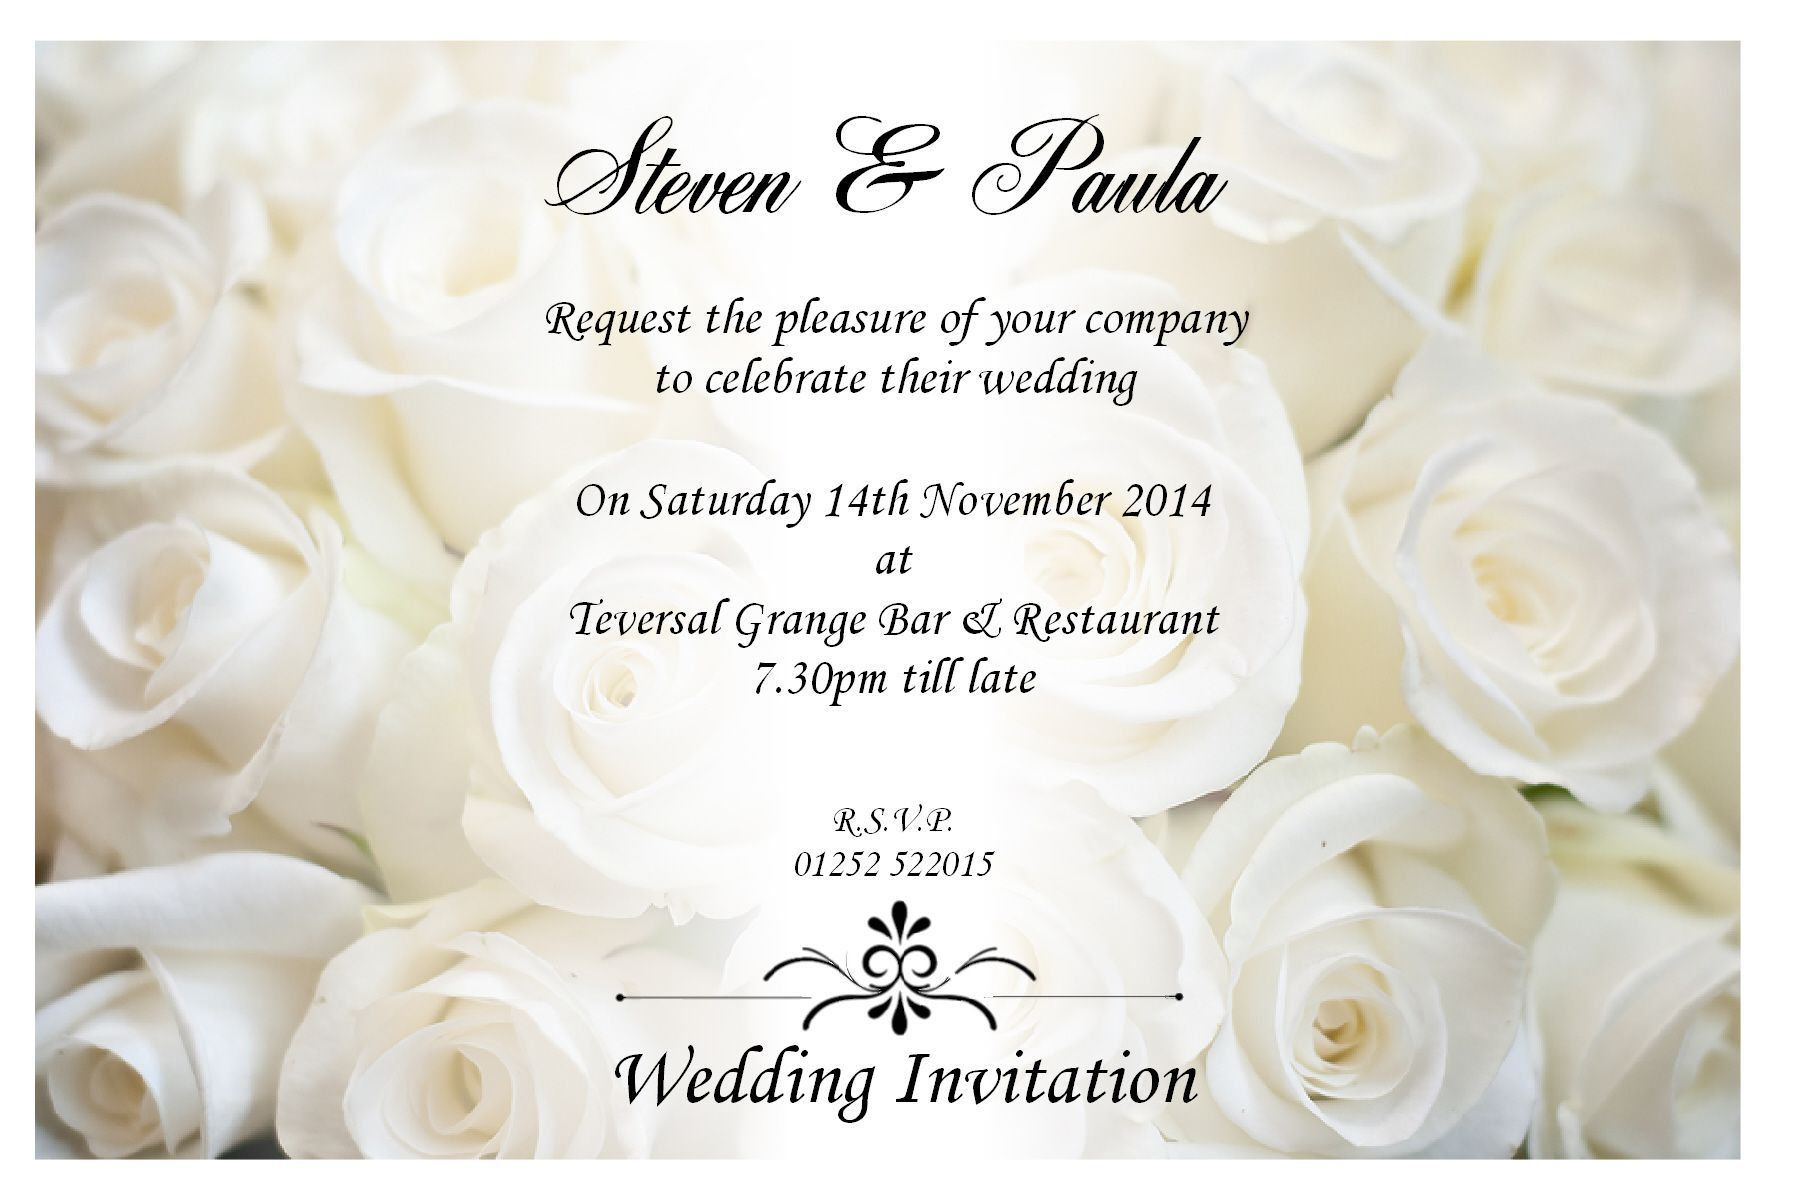 Wedding Invitation  Wedding Invitations Templates  Invitations